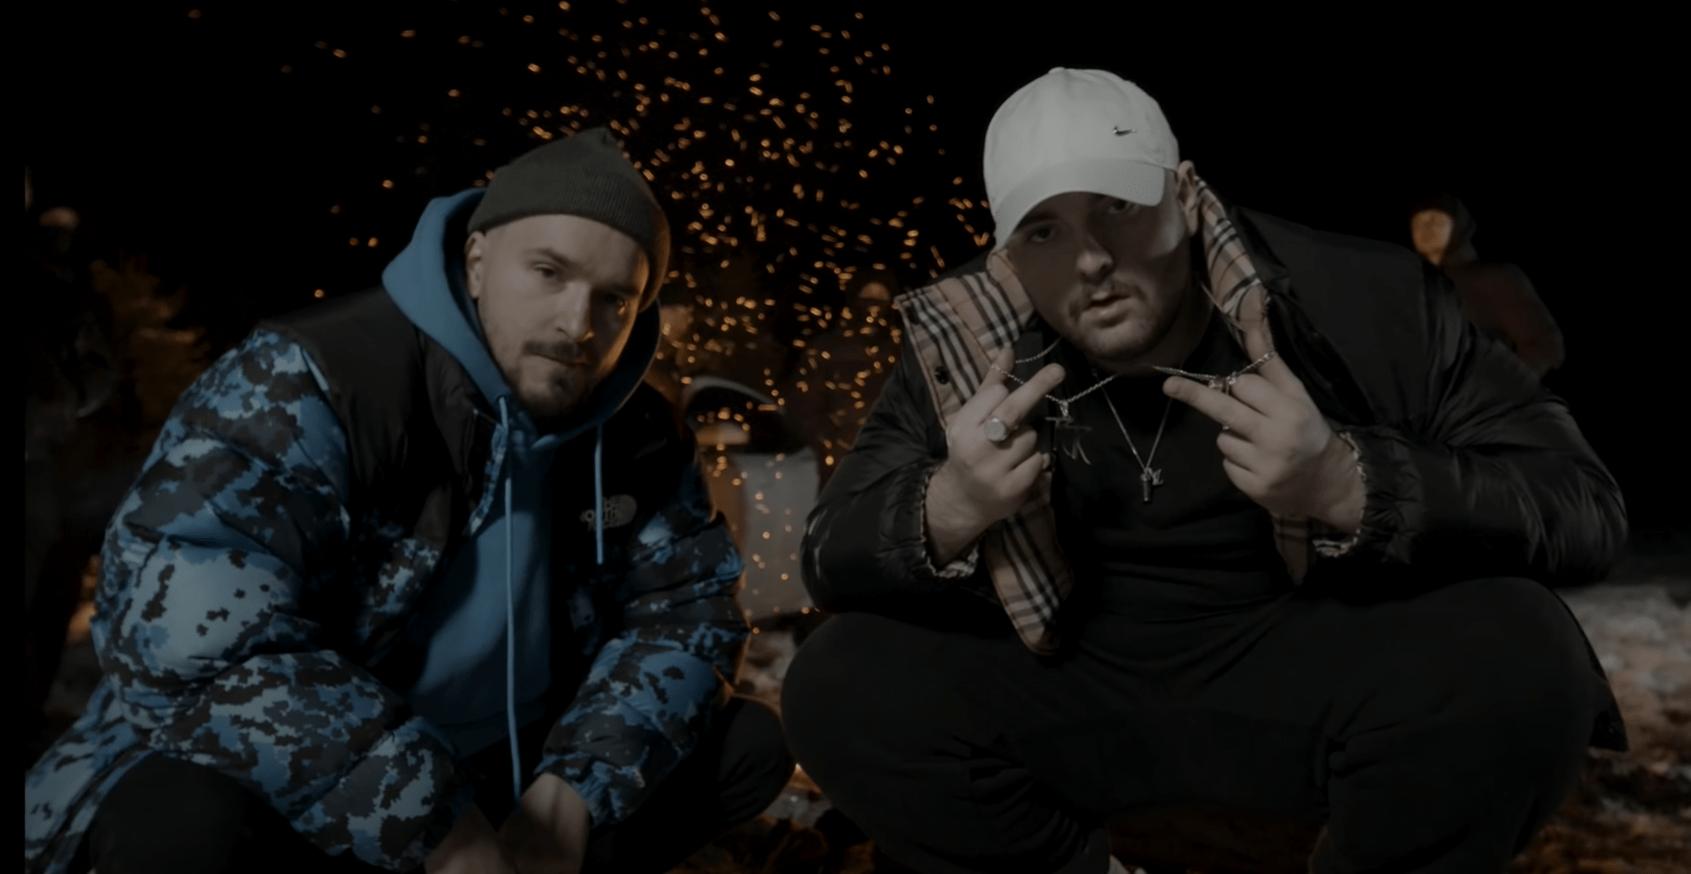 Bedoes & Lanek ft. Blu - Bukiet Białych Róż (SQUADSHIT #13) /